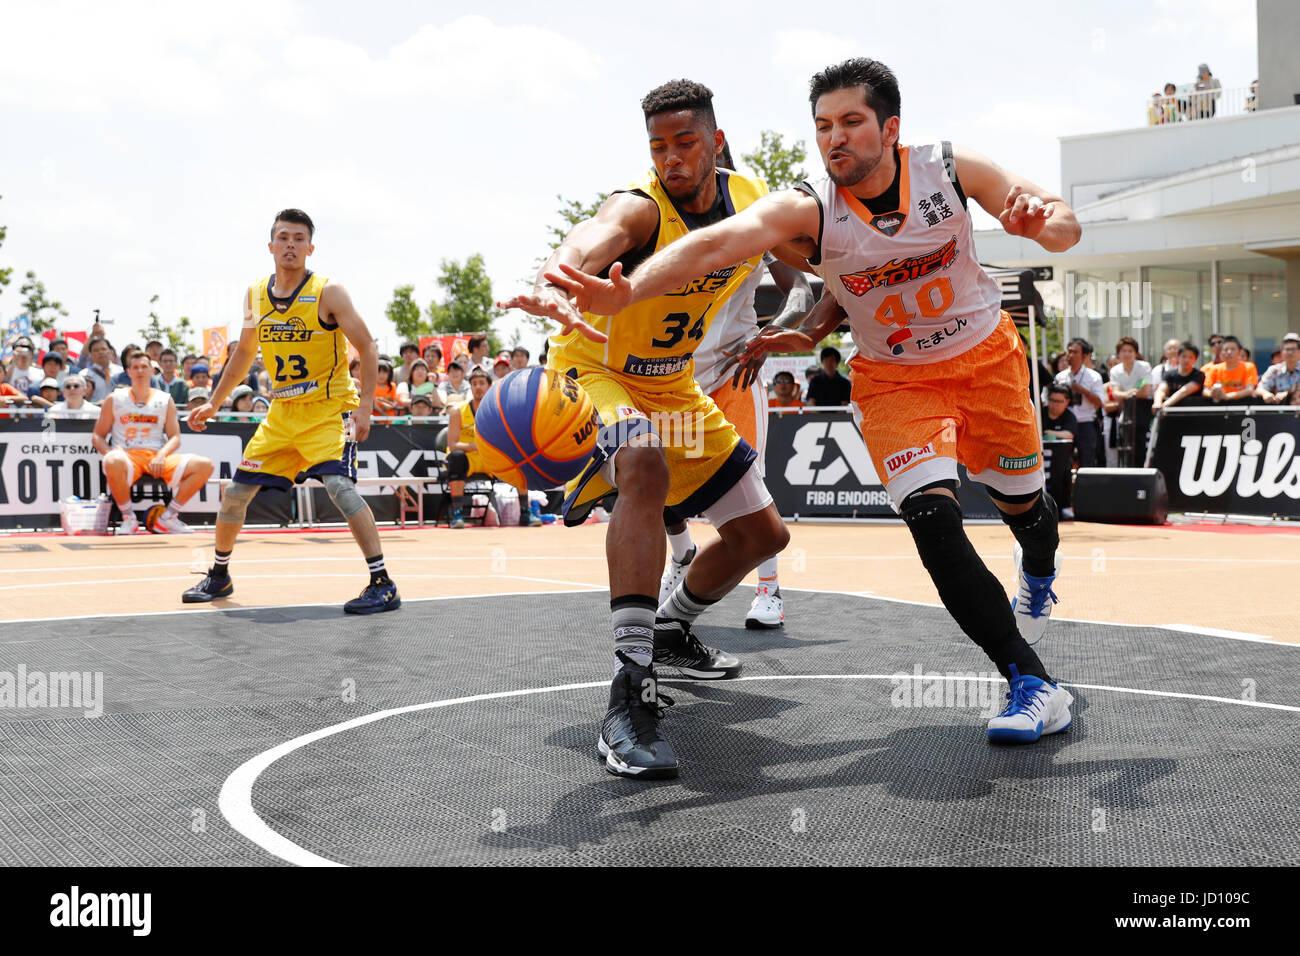 Tokyo, Japan. 17th June, 2017. (L-R) Kyle Richardson (BREX.EXE), Ken Tanaka (TACHIKAW DICE) Basketball : 33 PREMIER.EXE - Stock Image